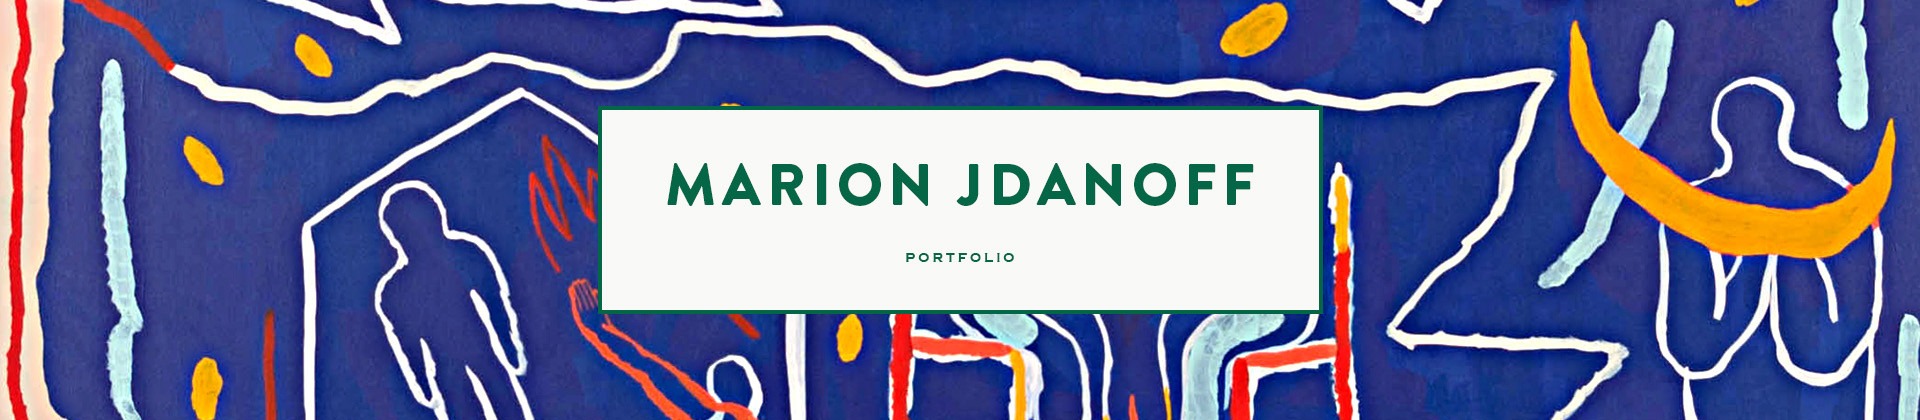 Marion Jdanoff